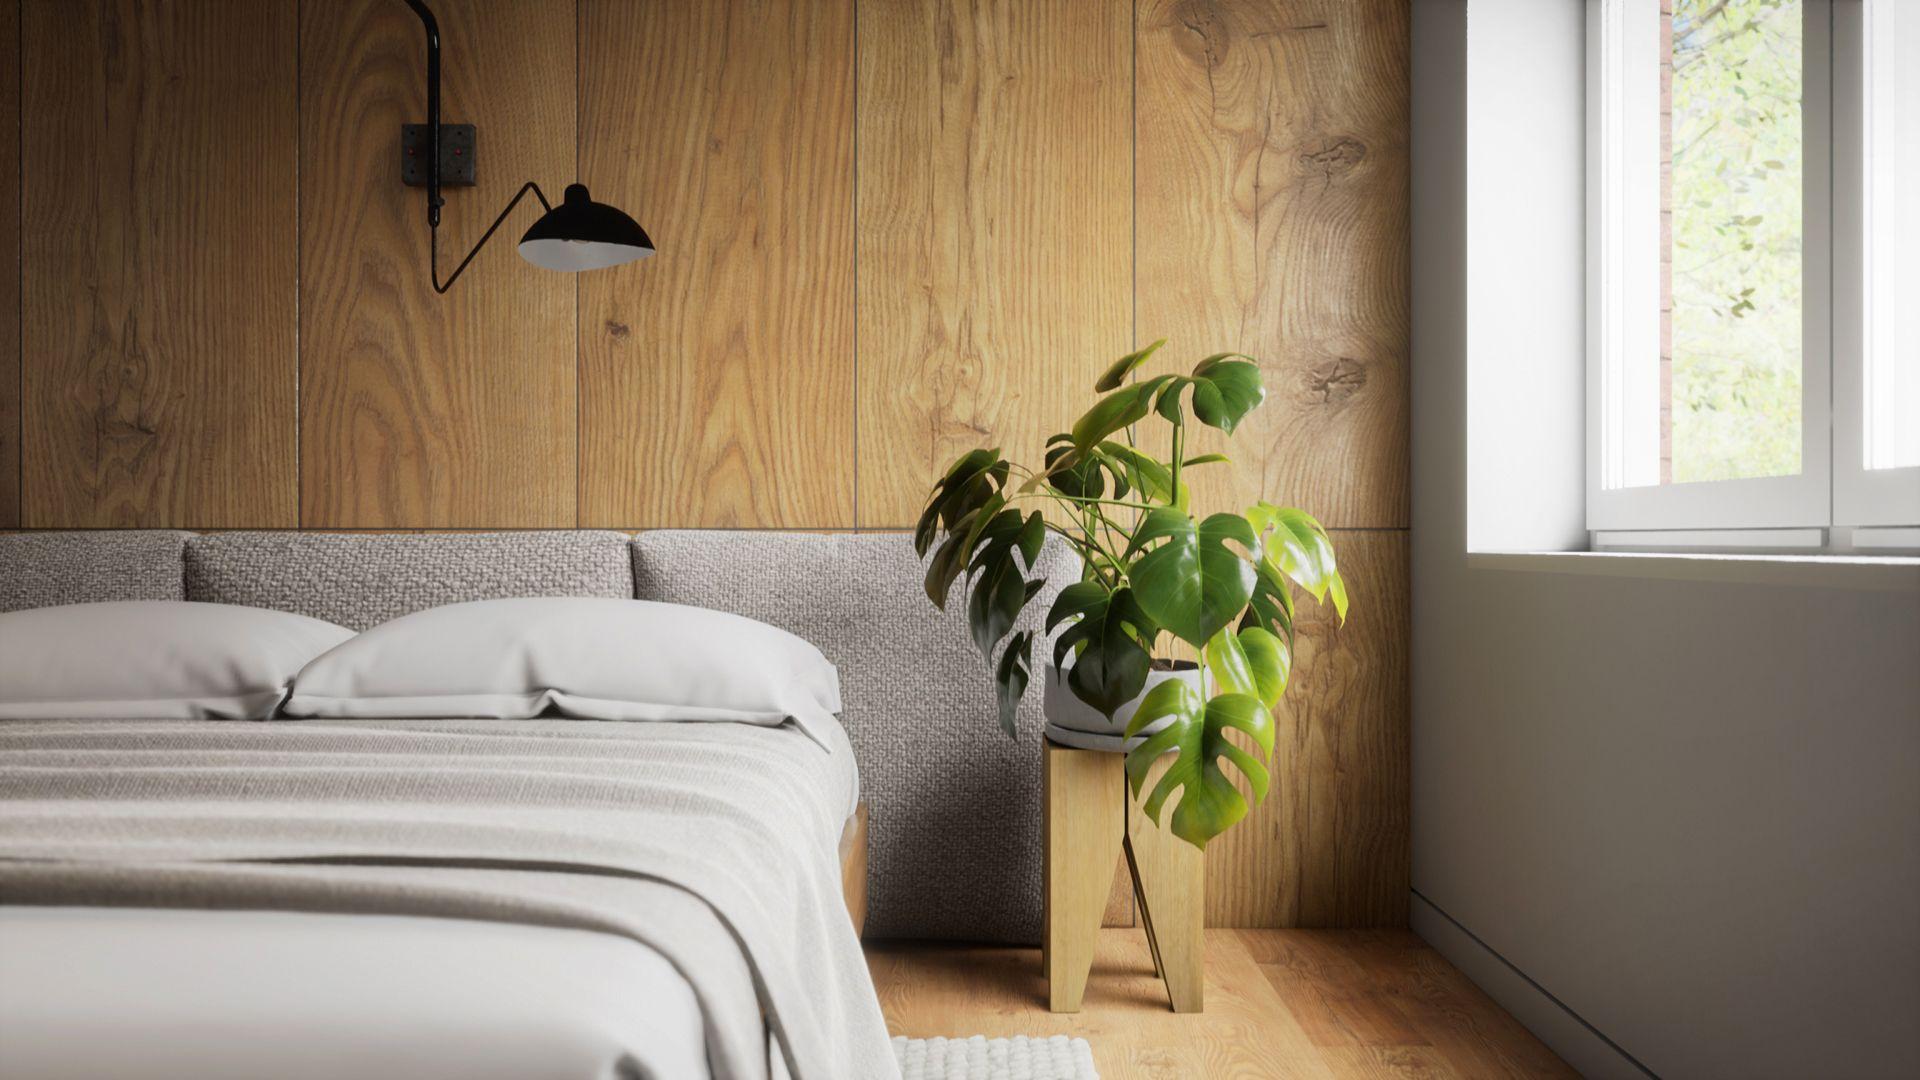 Bedroom lighting visualization